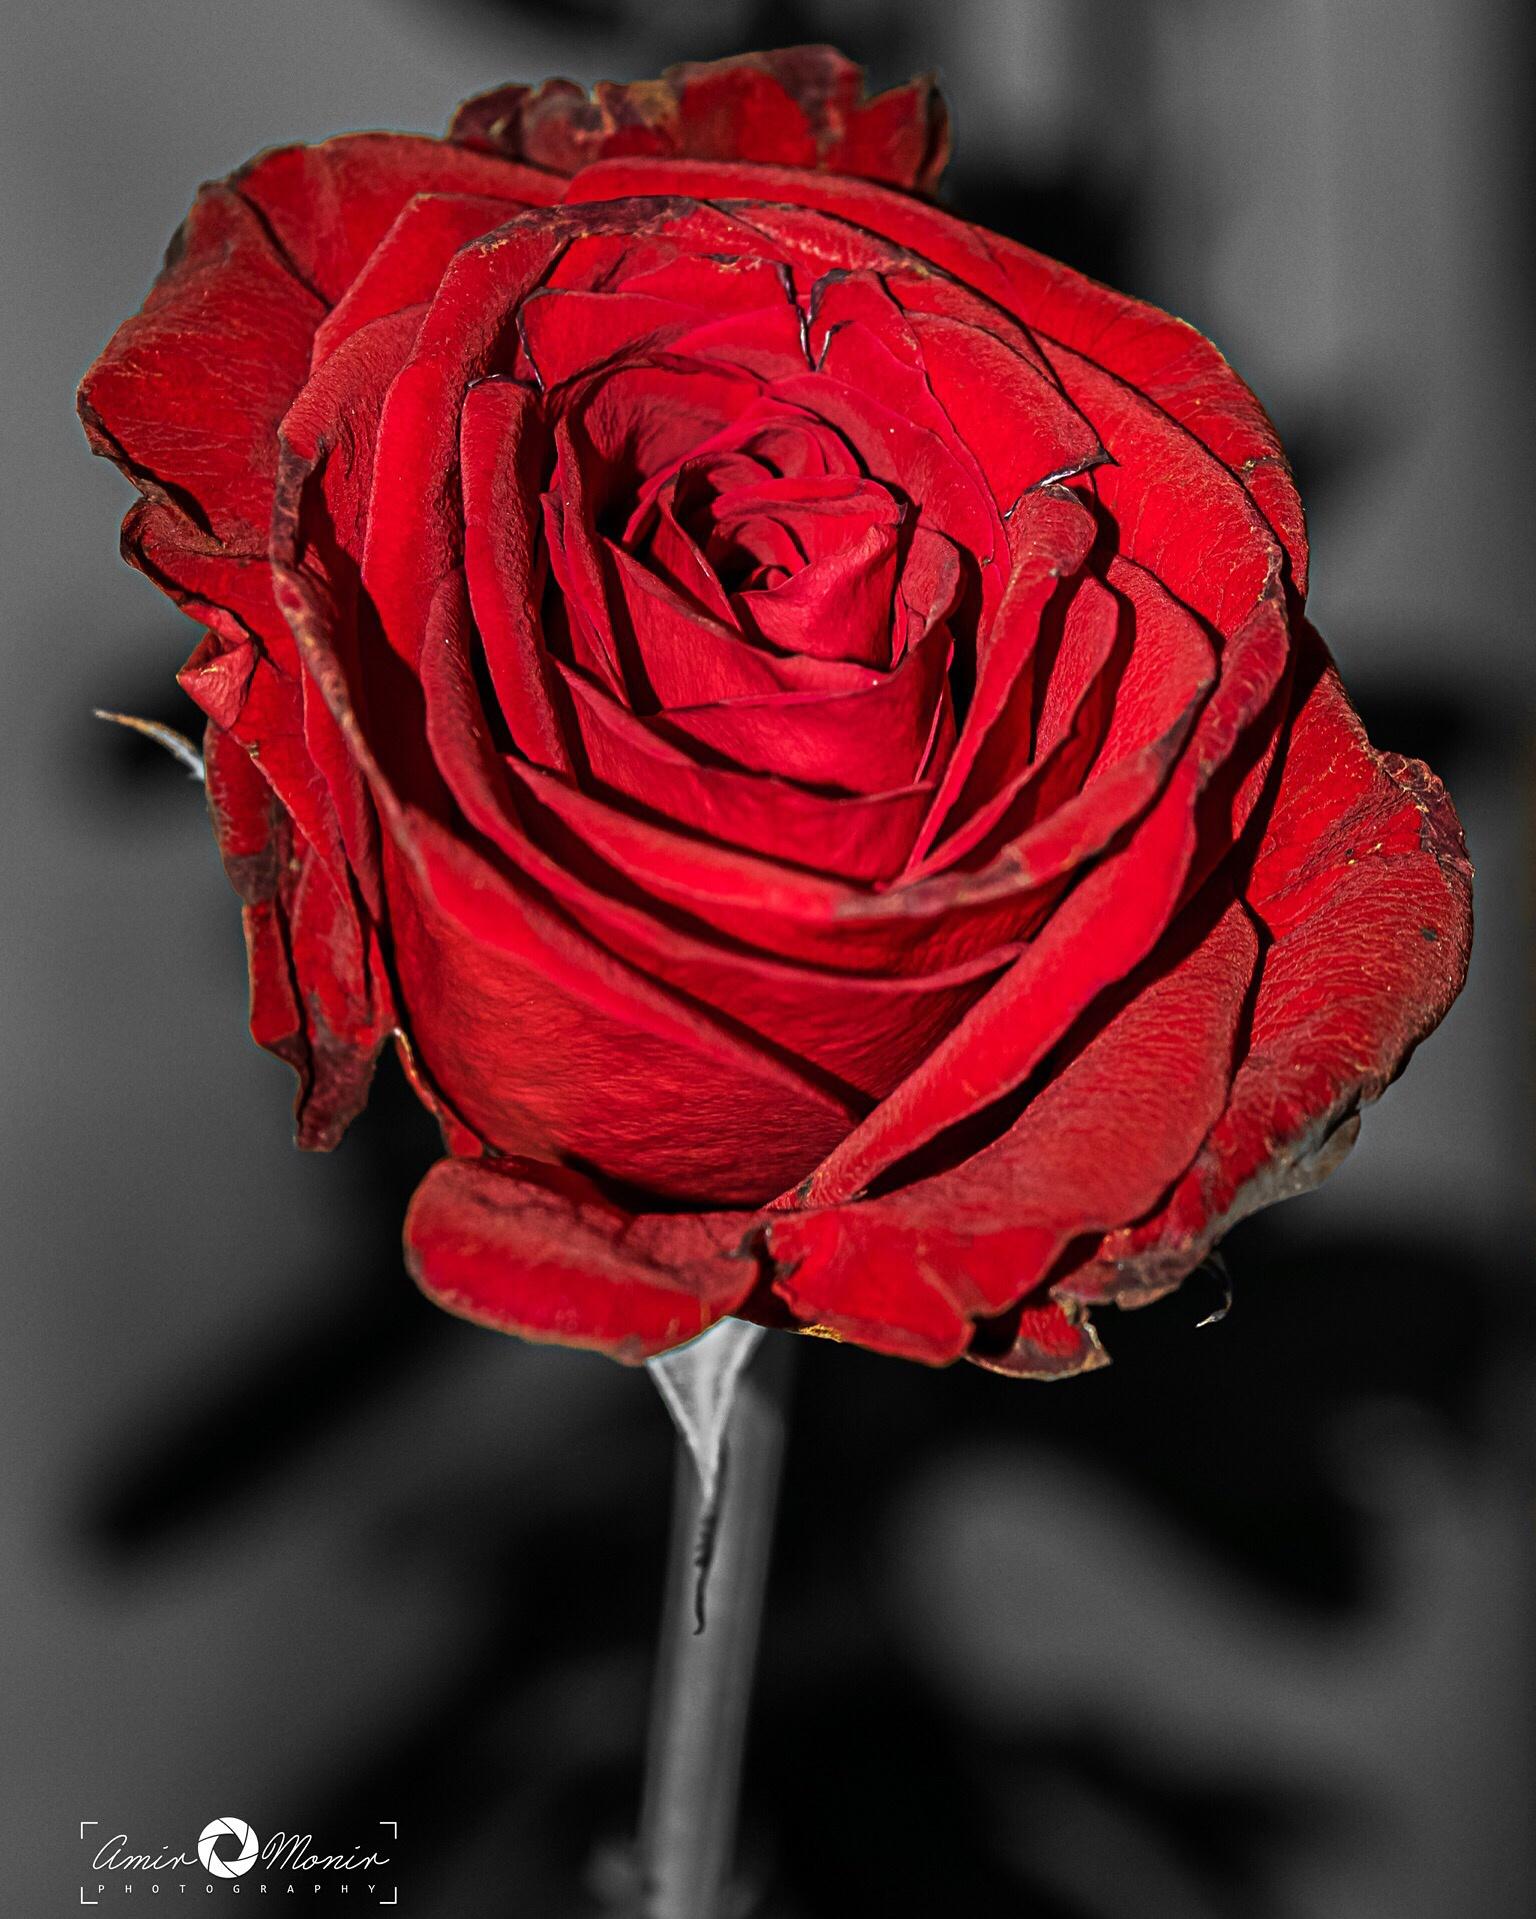 Flower  by Amir Monir